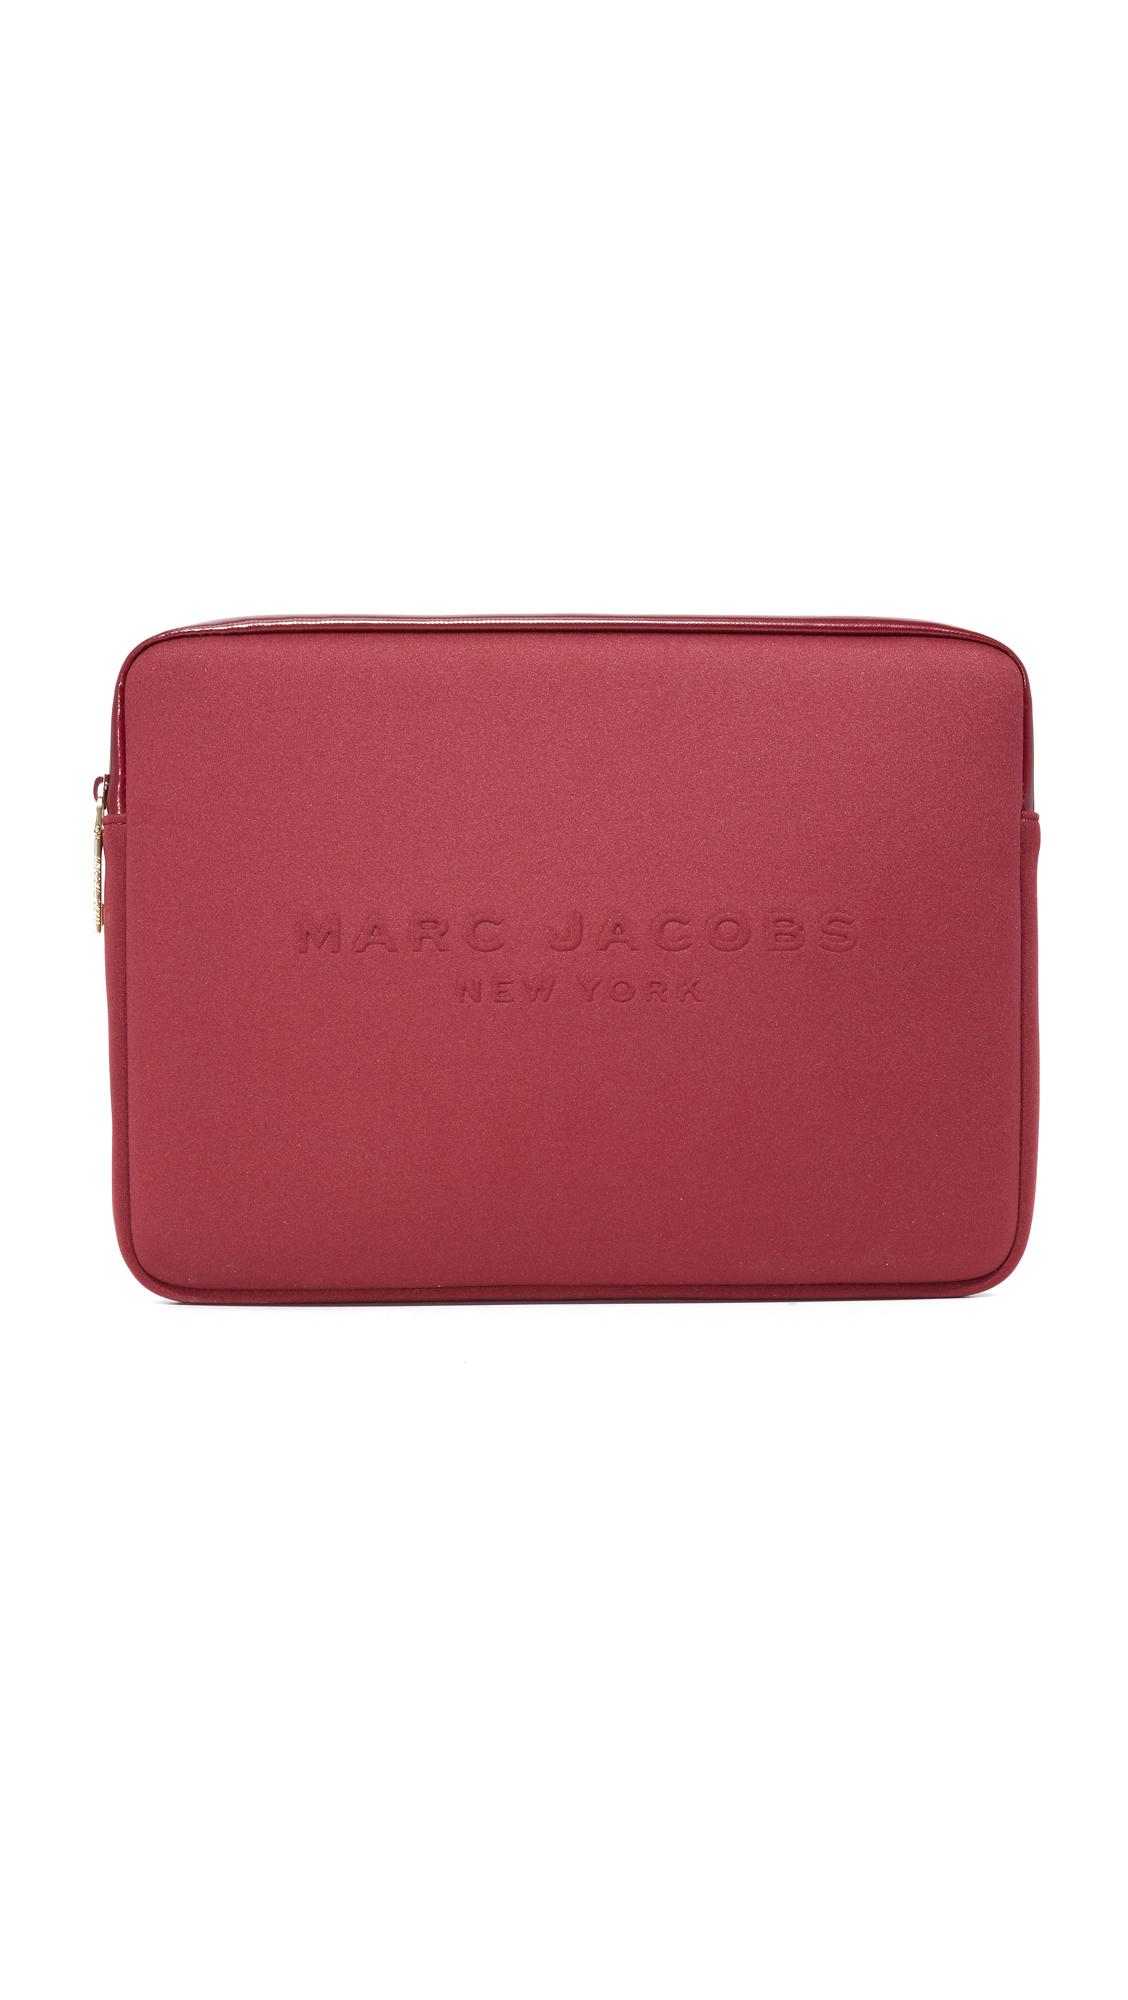 marc jacobs female 124072 marc jacobs 13 neoprene computer case dark cherry